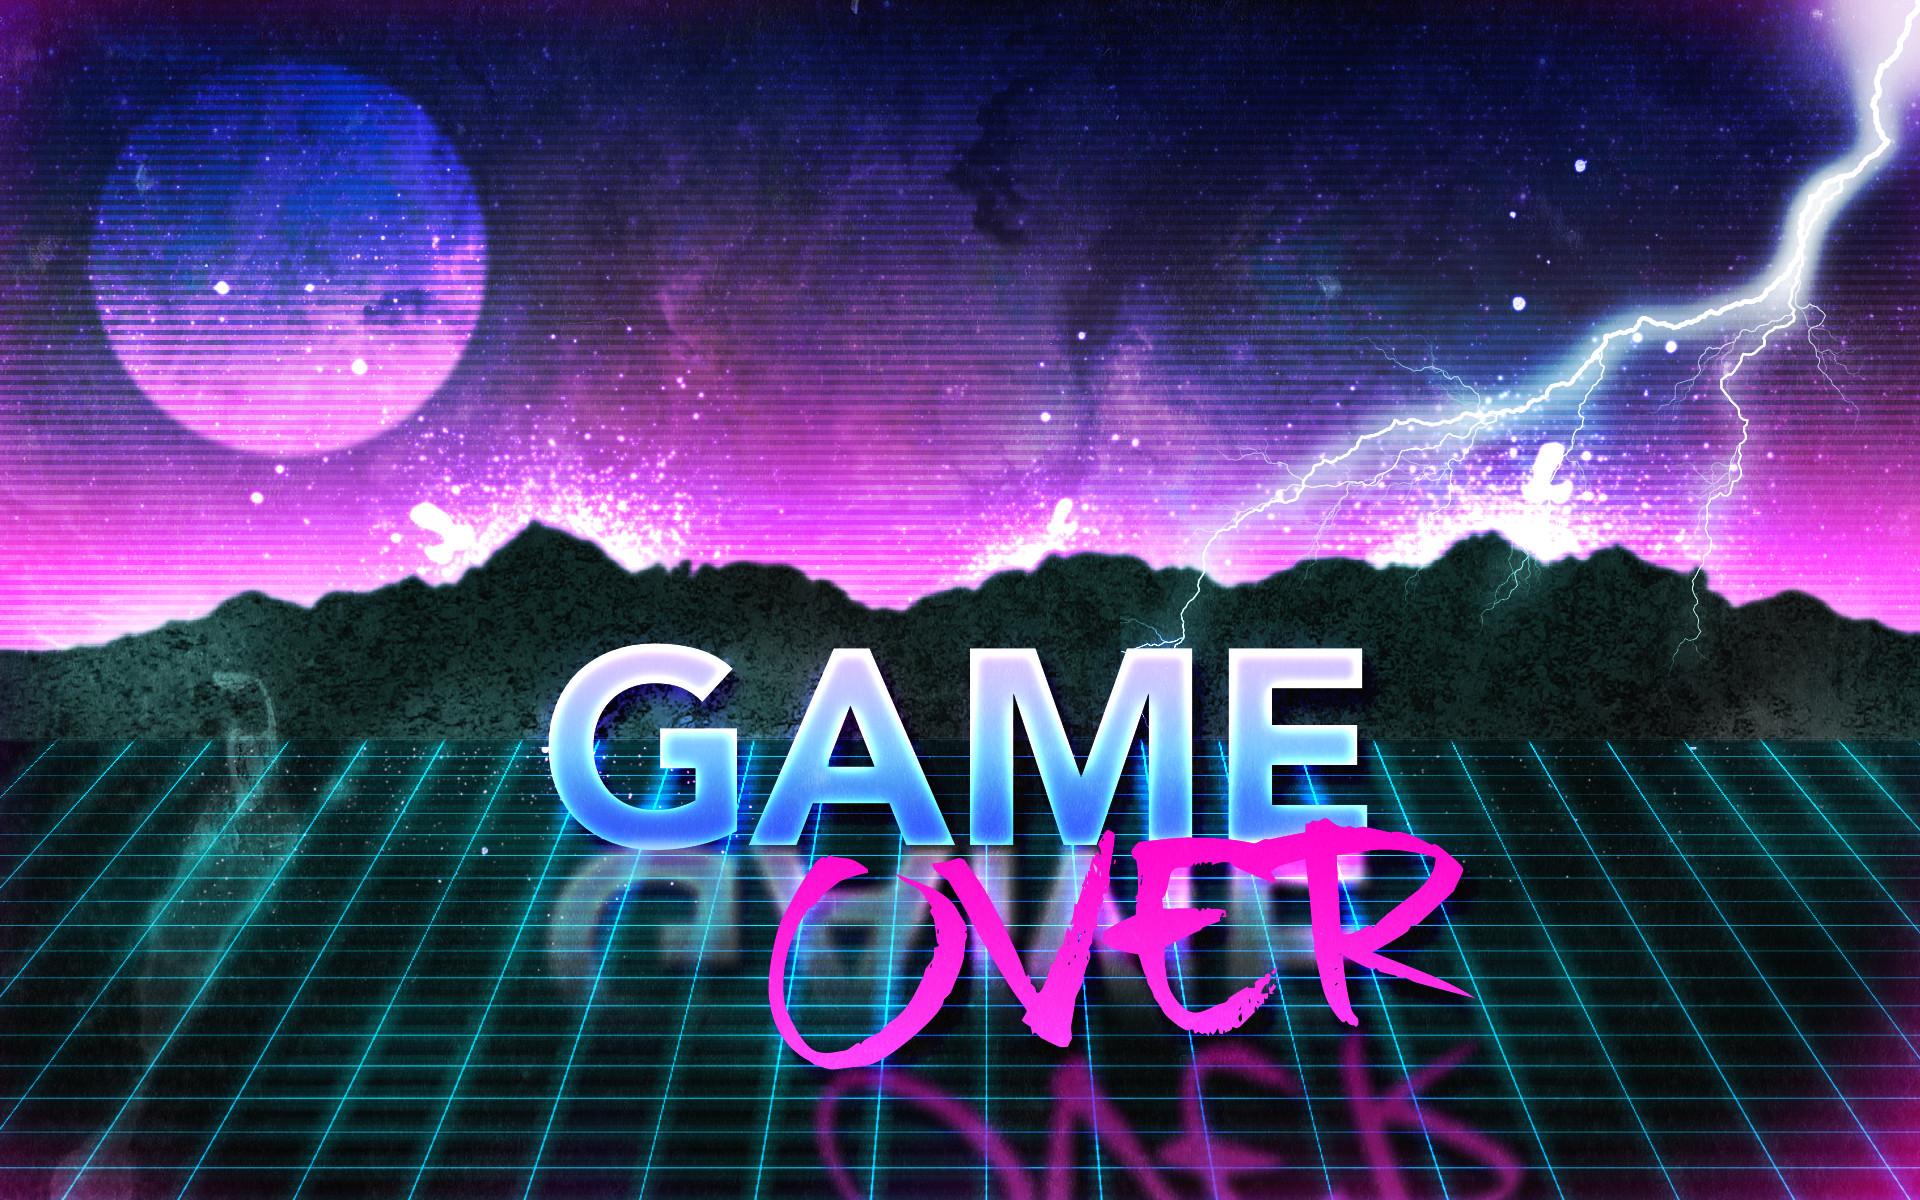 … 80s Retro Game Over Wallpaper by Leepiin